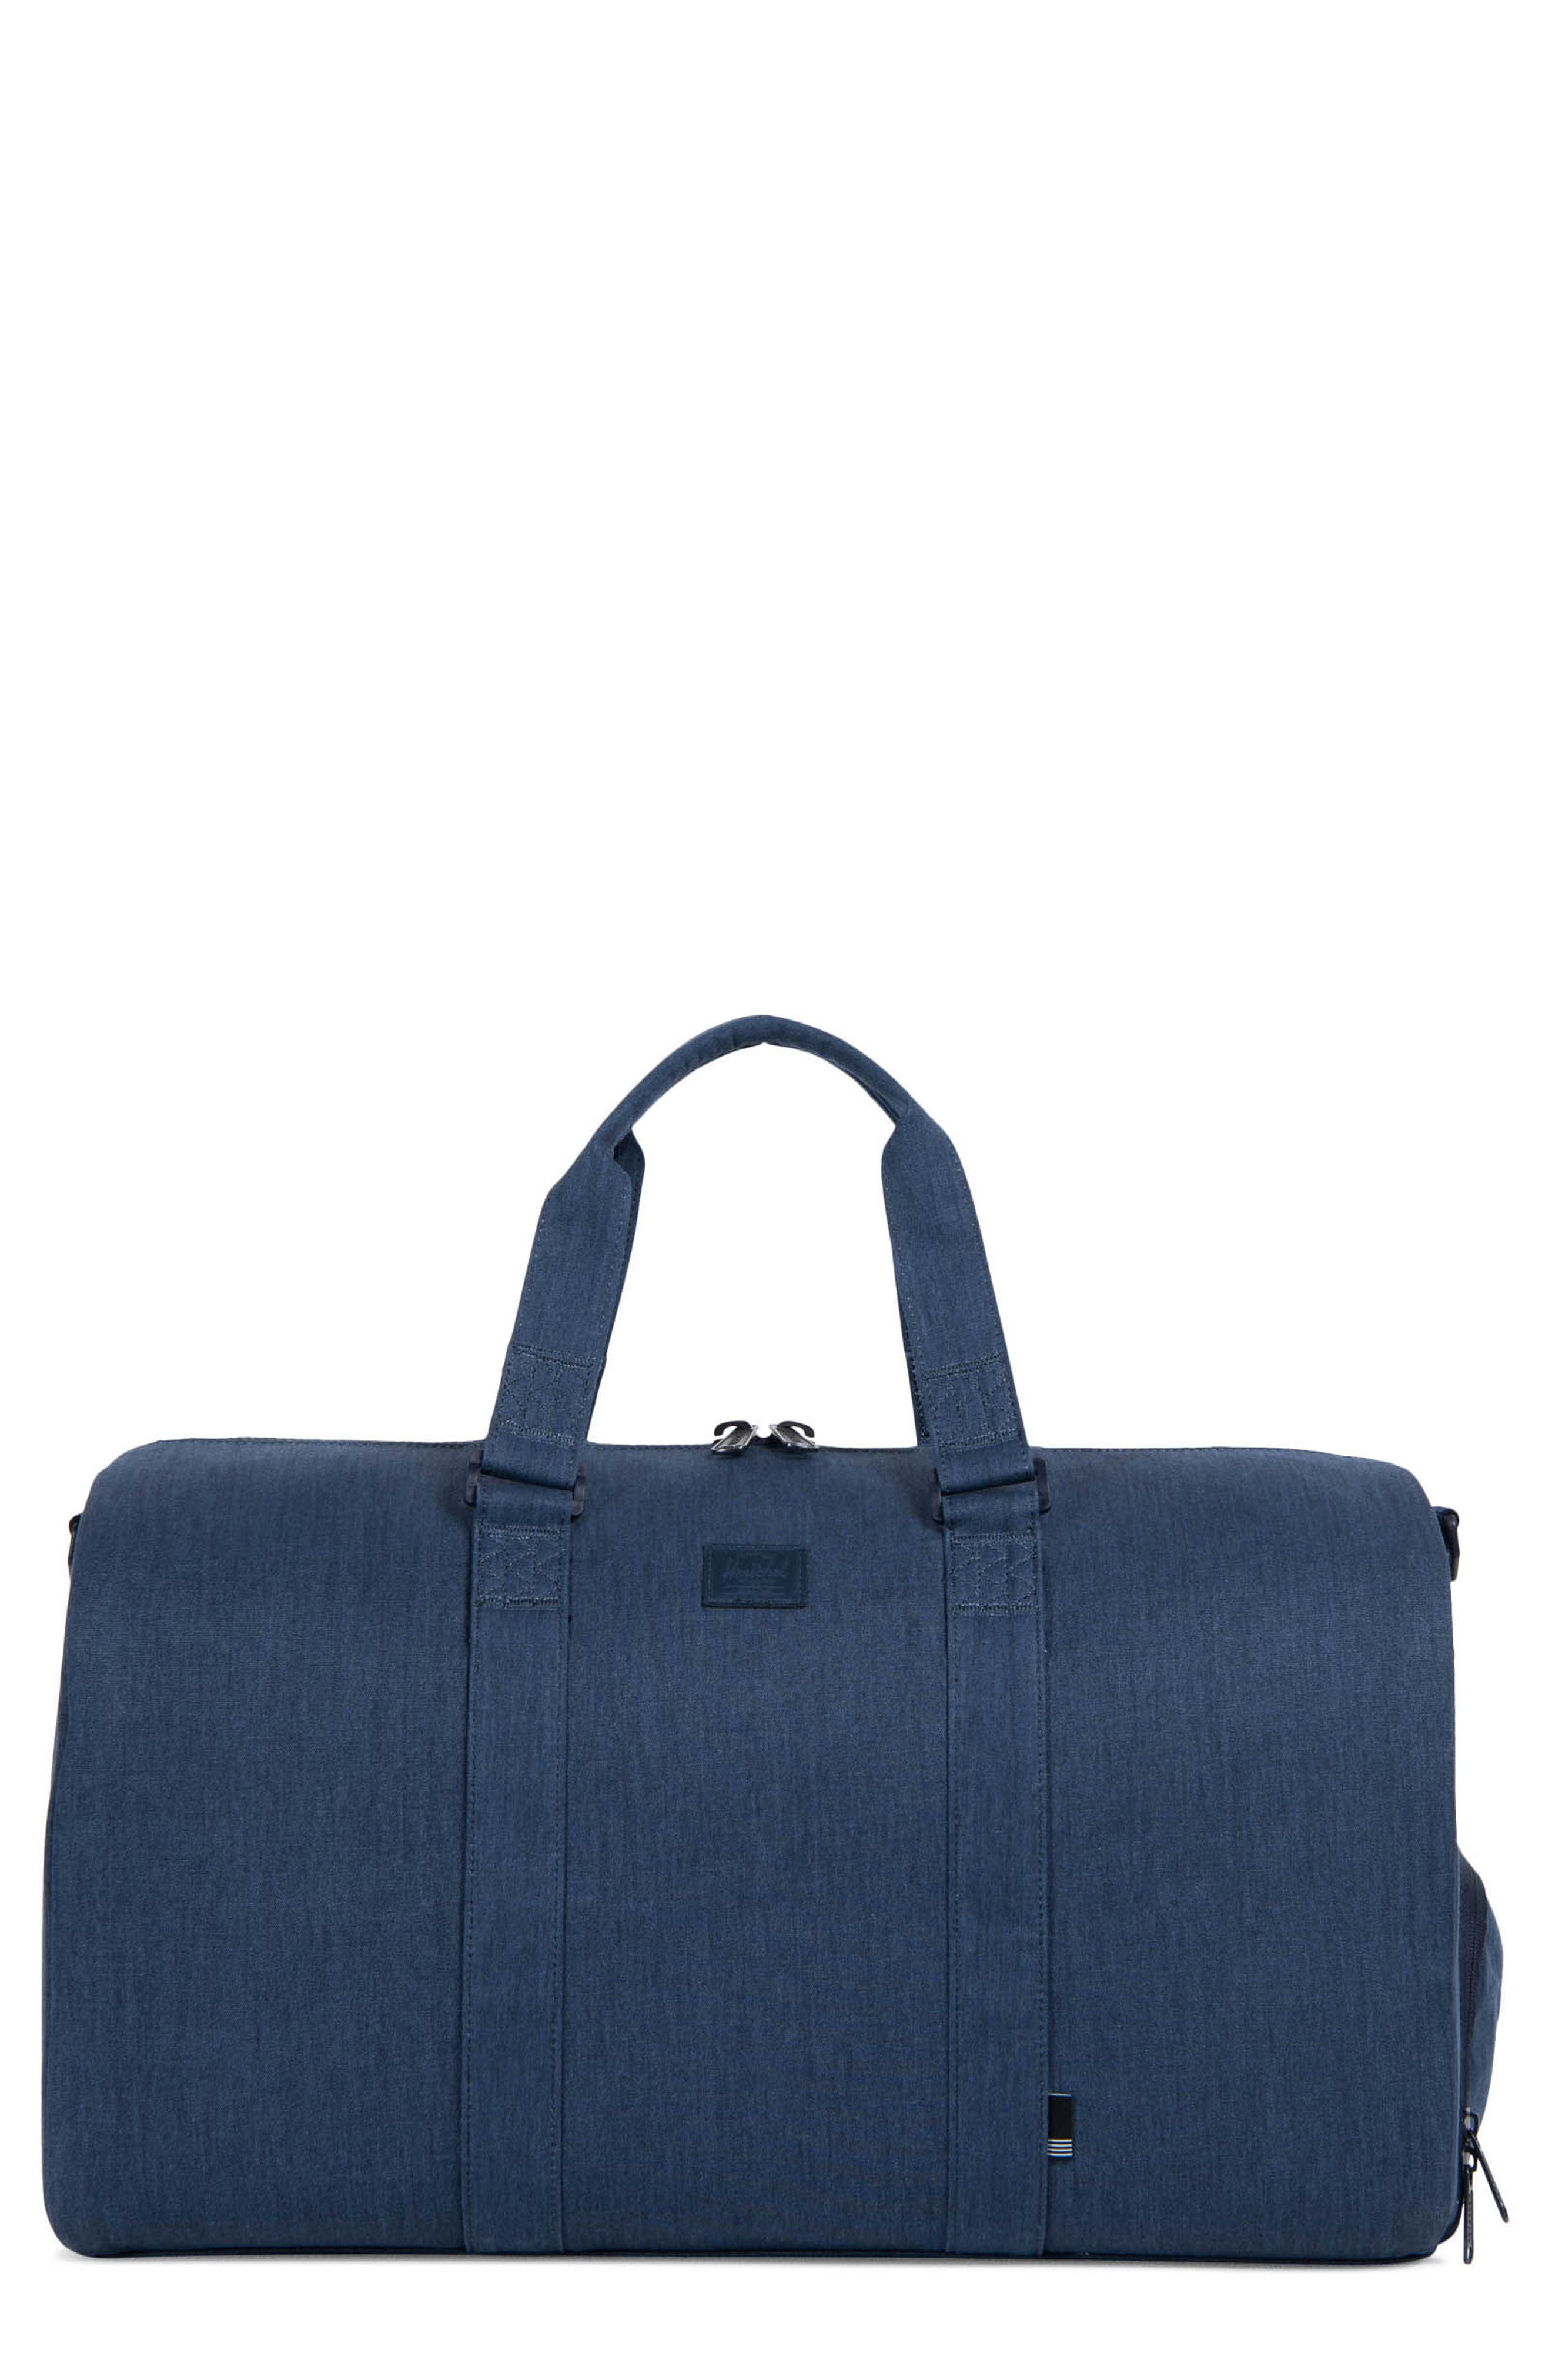 Novel Cotton Canvas Duffel Bag,                         Main,                         color, Peacoat